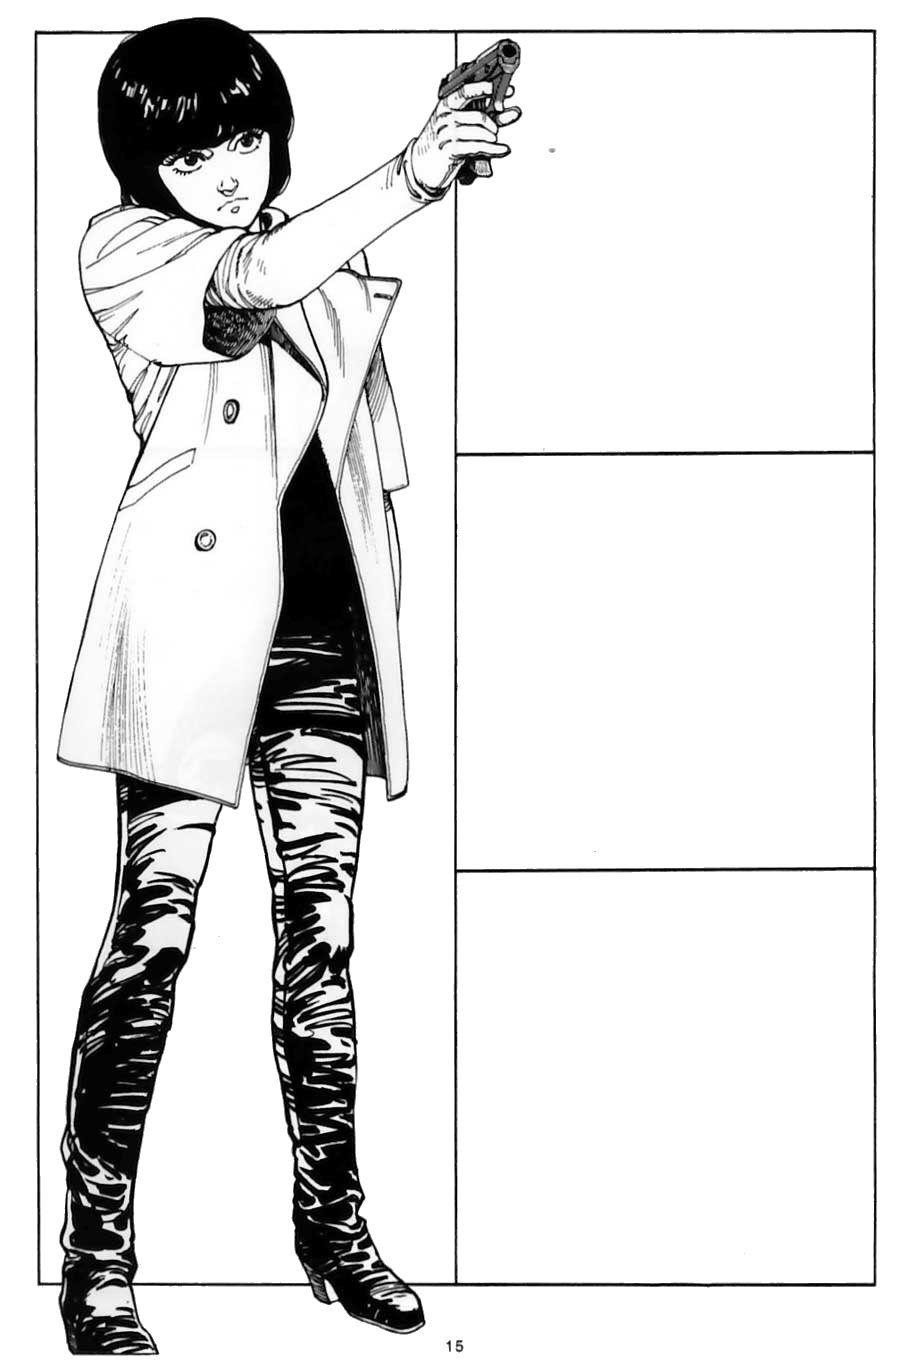 Akira By 大友 克洋 Katsuhiro ōtomo Blog Info Https En Wikipedia Org Wiki Katsuhiro Otomo Character Design References Https Nghệ Thuật Y Tưởng